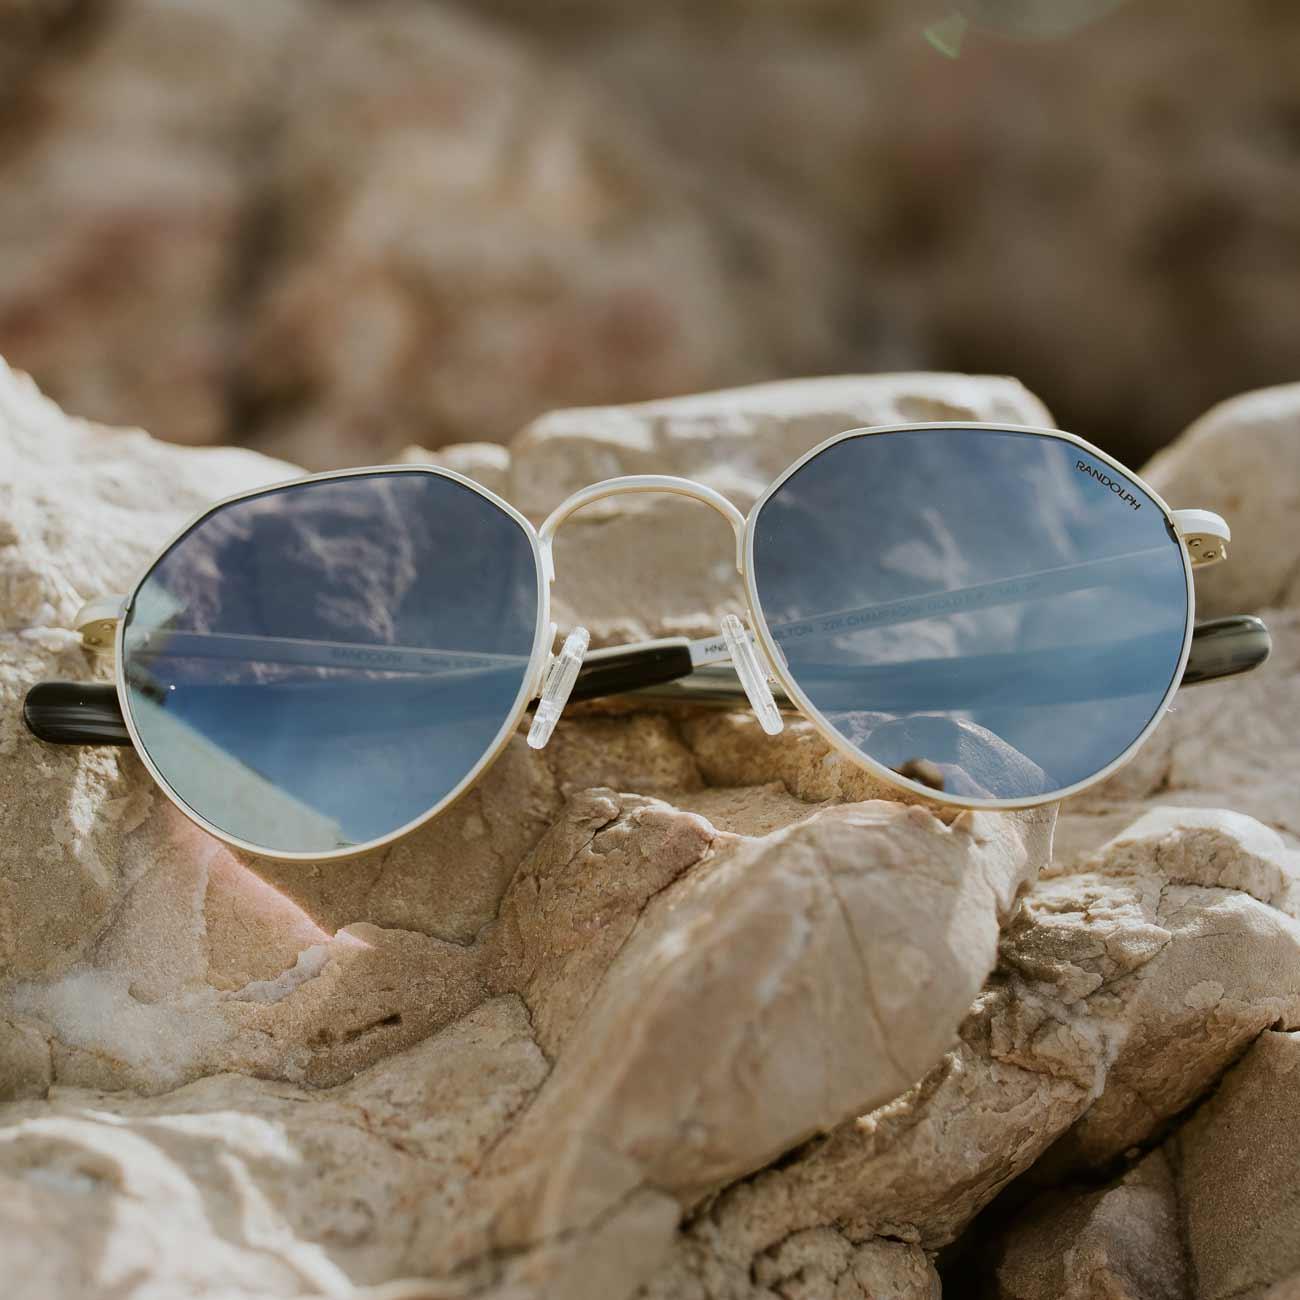 Mirrored Sunglasses for Men & Women - featured style: Hamilton